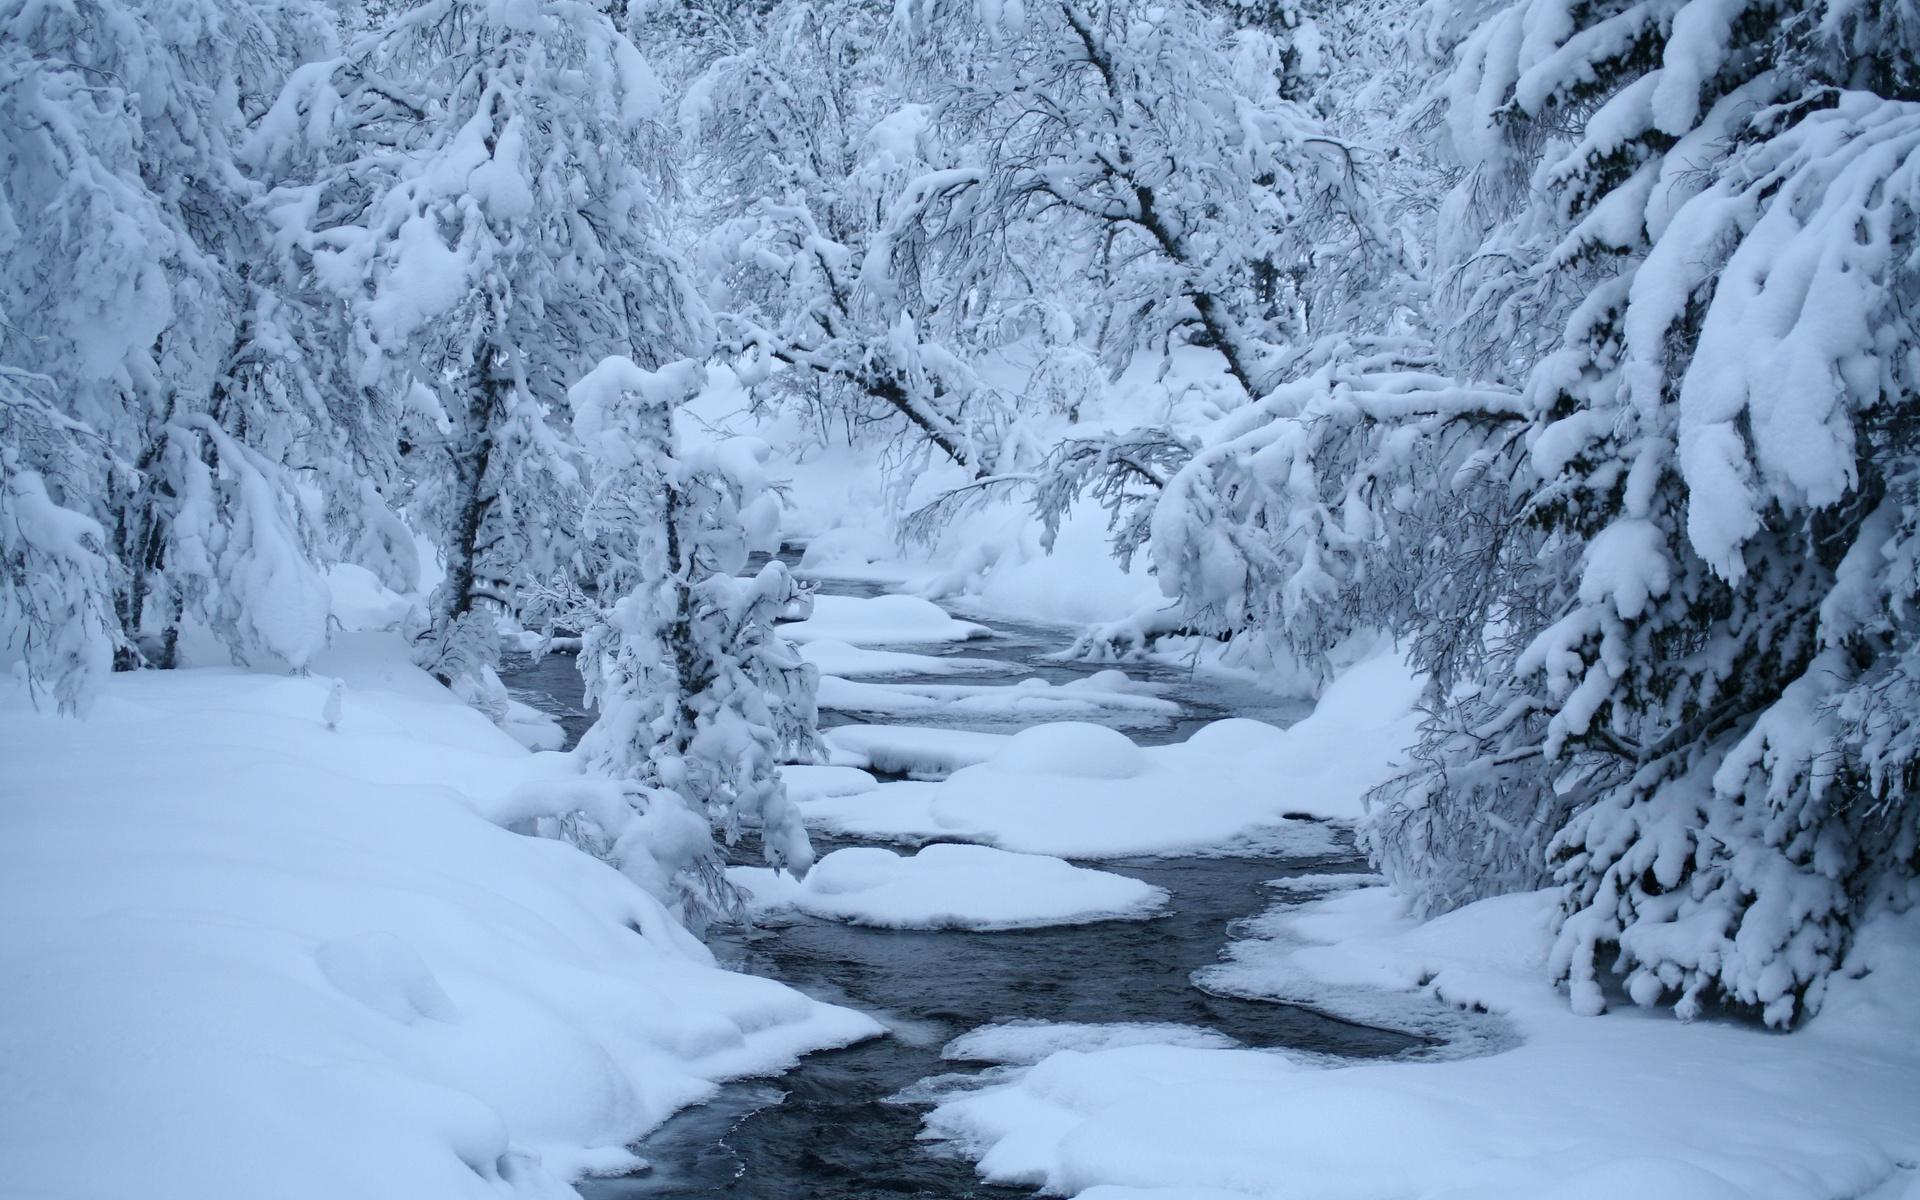 Winter River Snow Trees Hd Wallpaper Wallpaper List 1920x1200